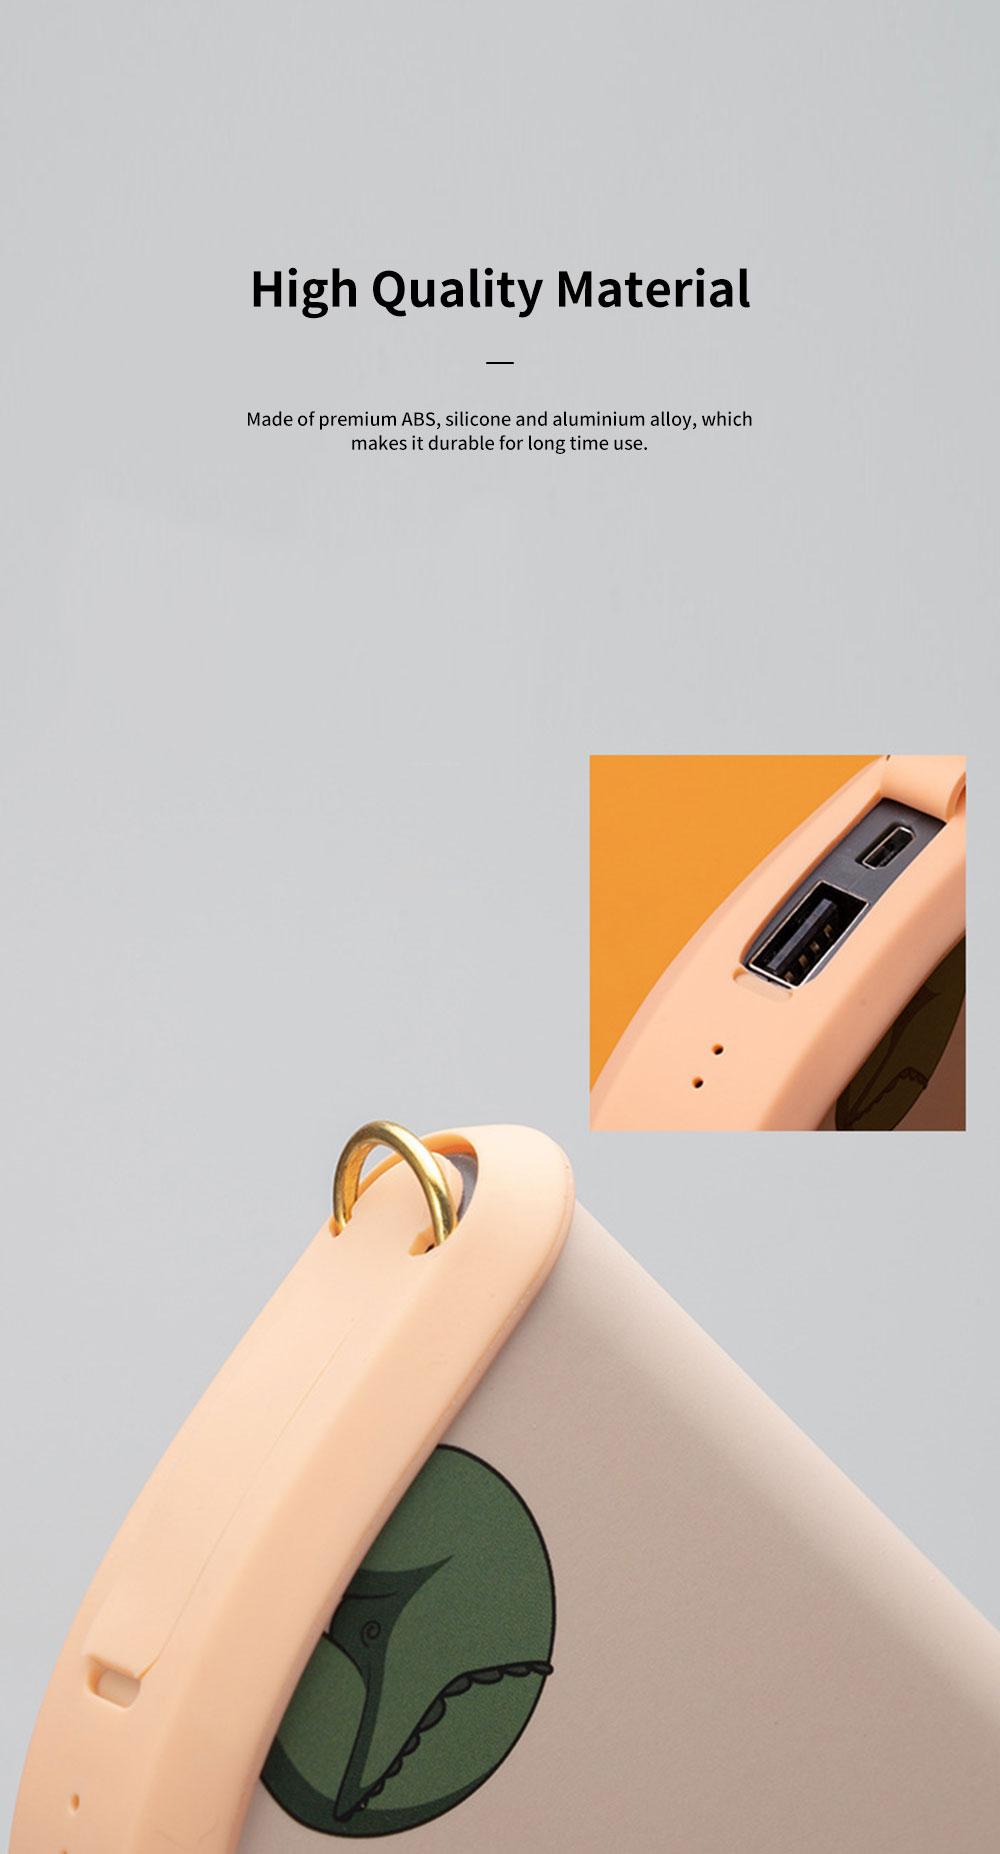 Portable Handbag Hand Warmer Unique Shoulder Bag-shaped Hands Warm Elf with 5000mAh Battery and USB Port for Phone Charging 6